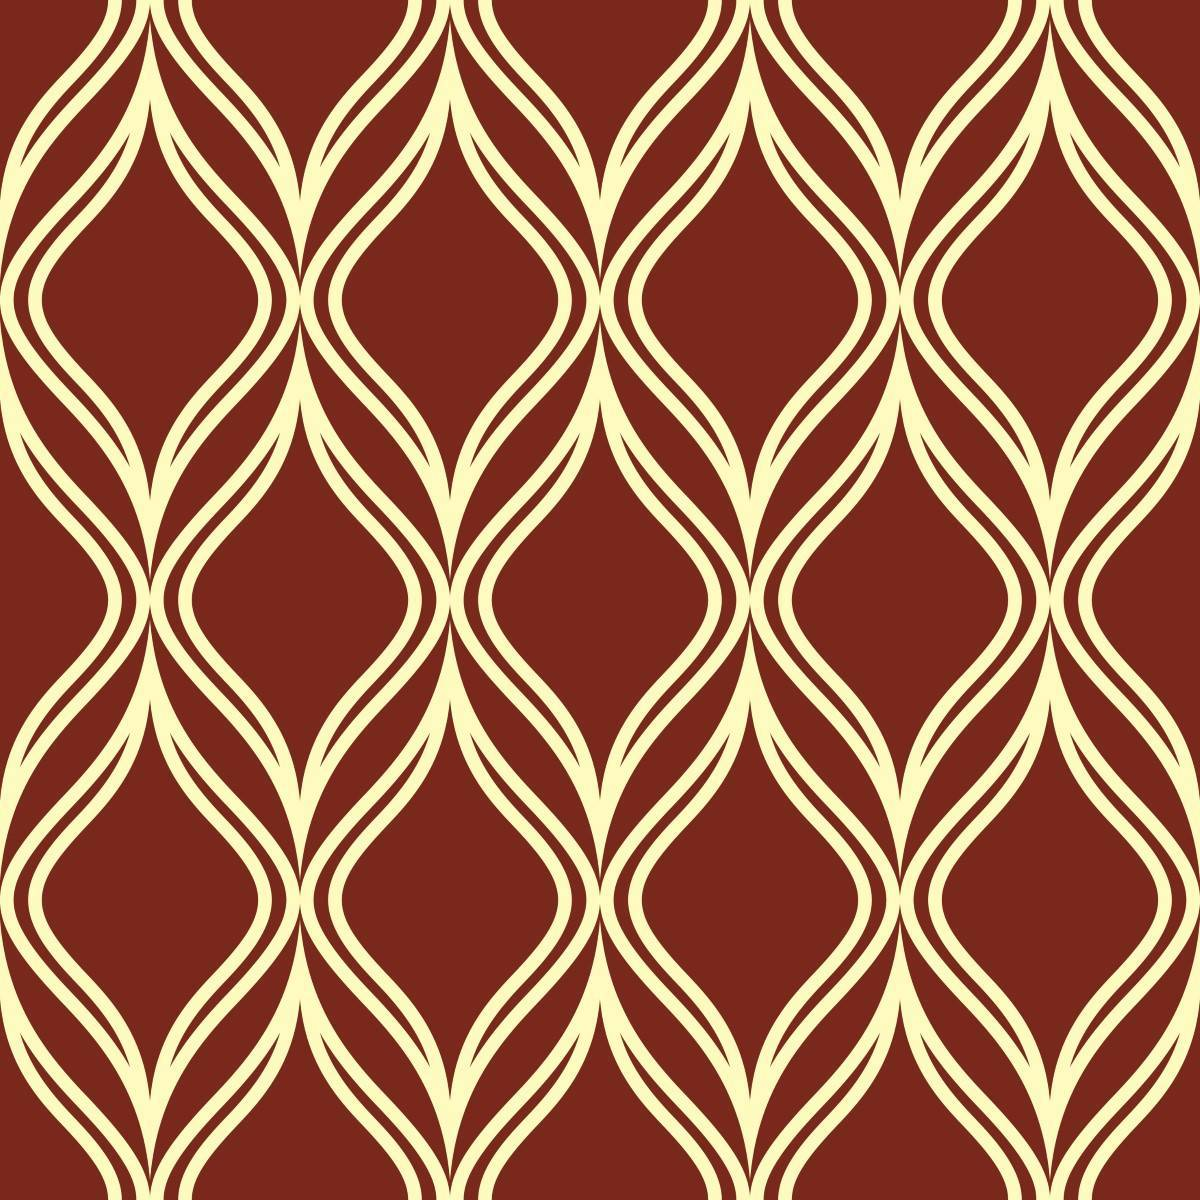 Papel de Parede Bordô | Adesivo Vinilico imagem 2